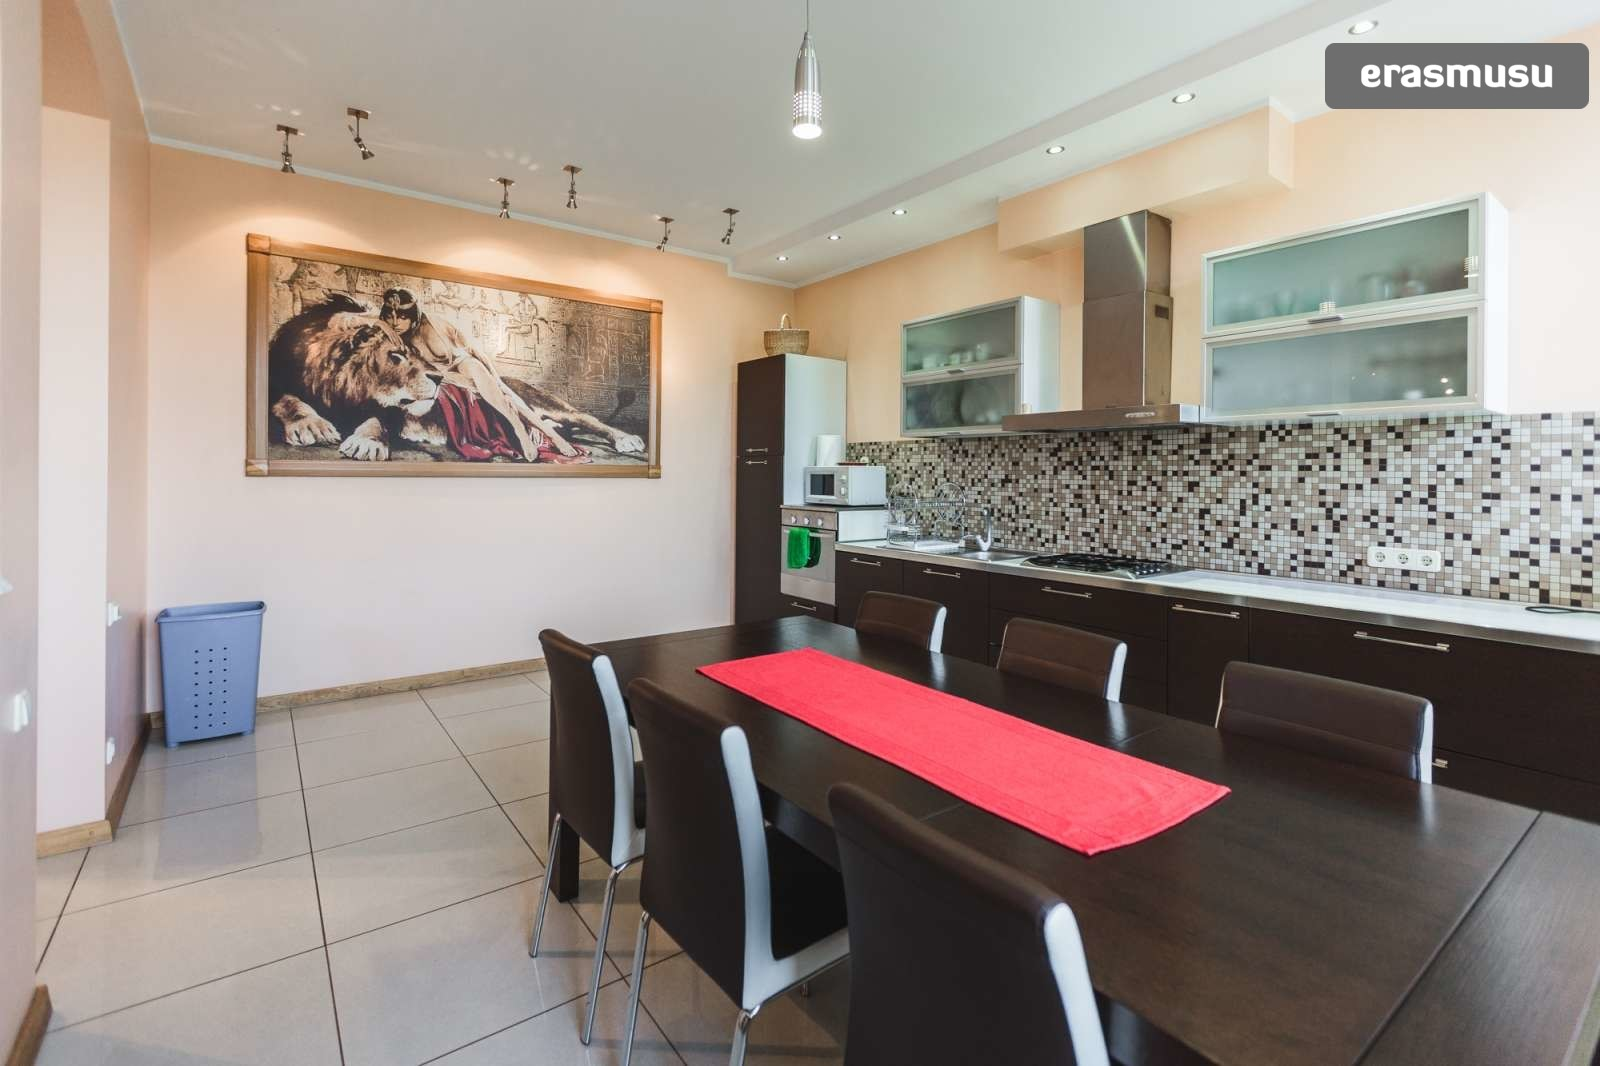 modern-4-bedroom-apartment-rent-centrs-0b9aa309e8d0230943ef610b3